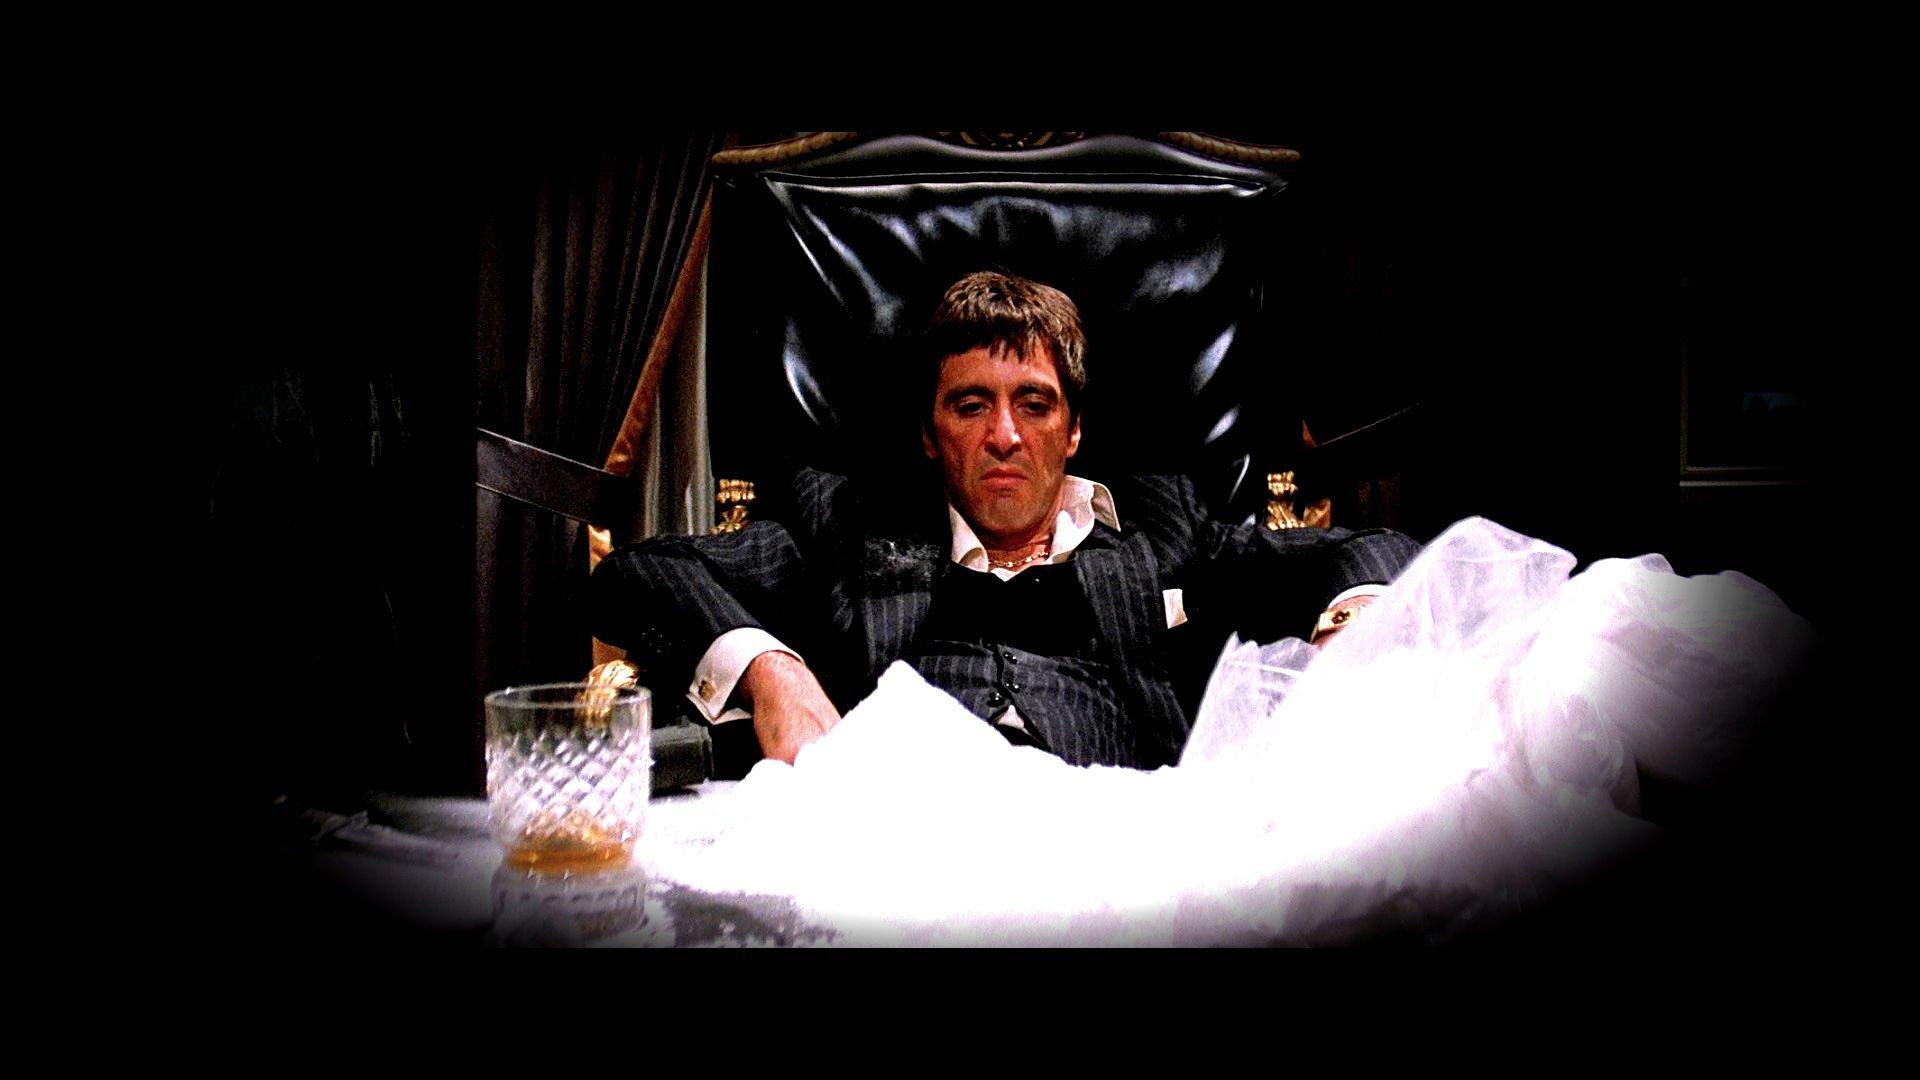 SCARFACE crime drama movie film dark drugs wallpaper | 1920x1080 ... Al Pacino